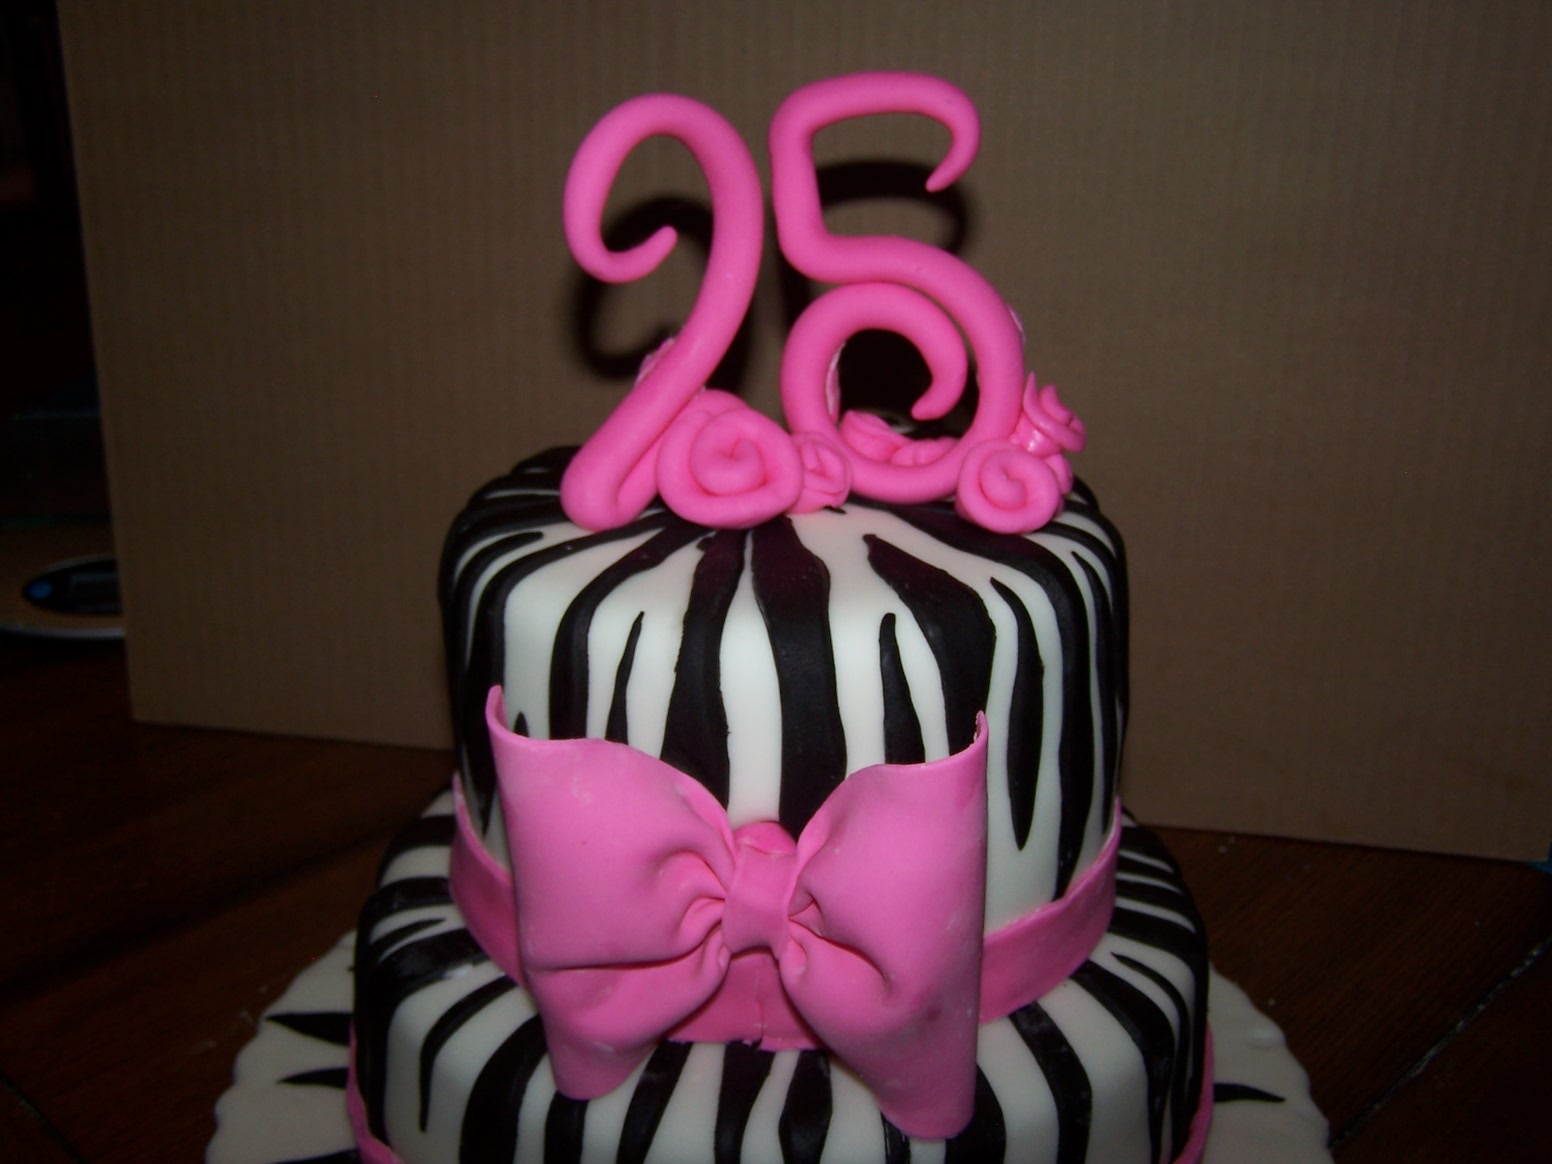 Happy 25th Birthday Cake Ideas 12930 Cake Birthday Cakes W